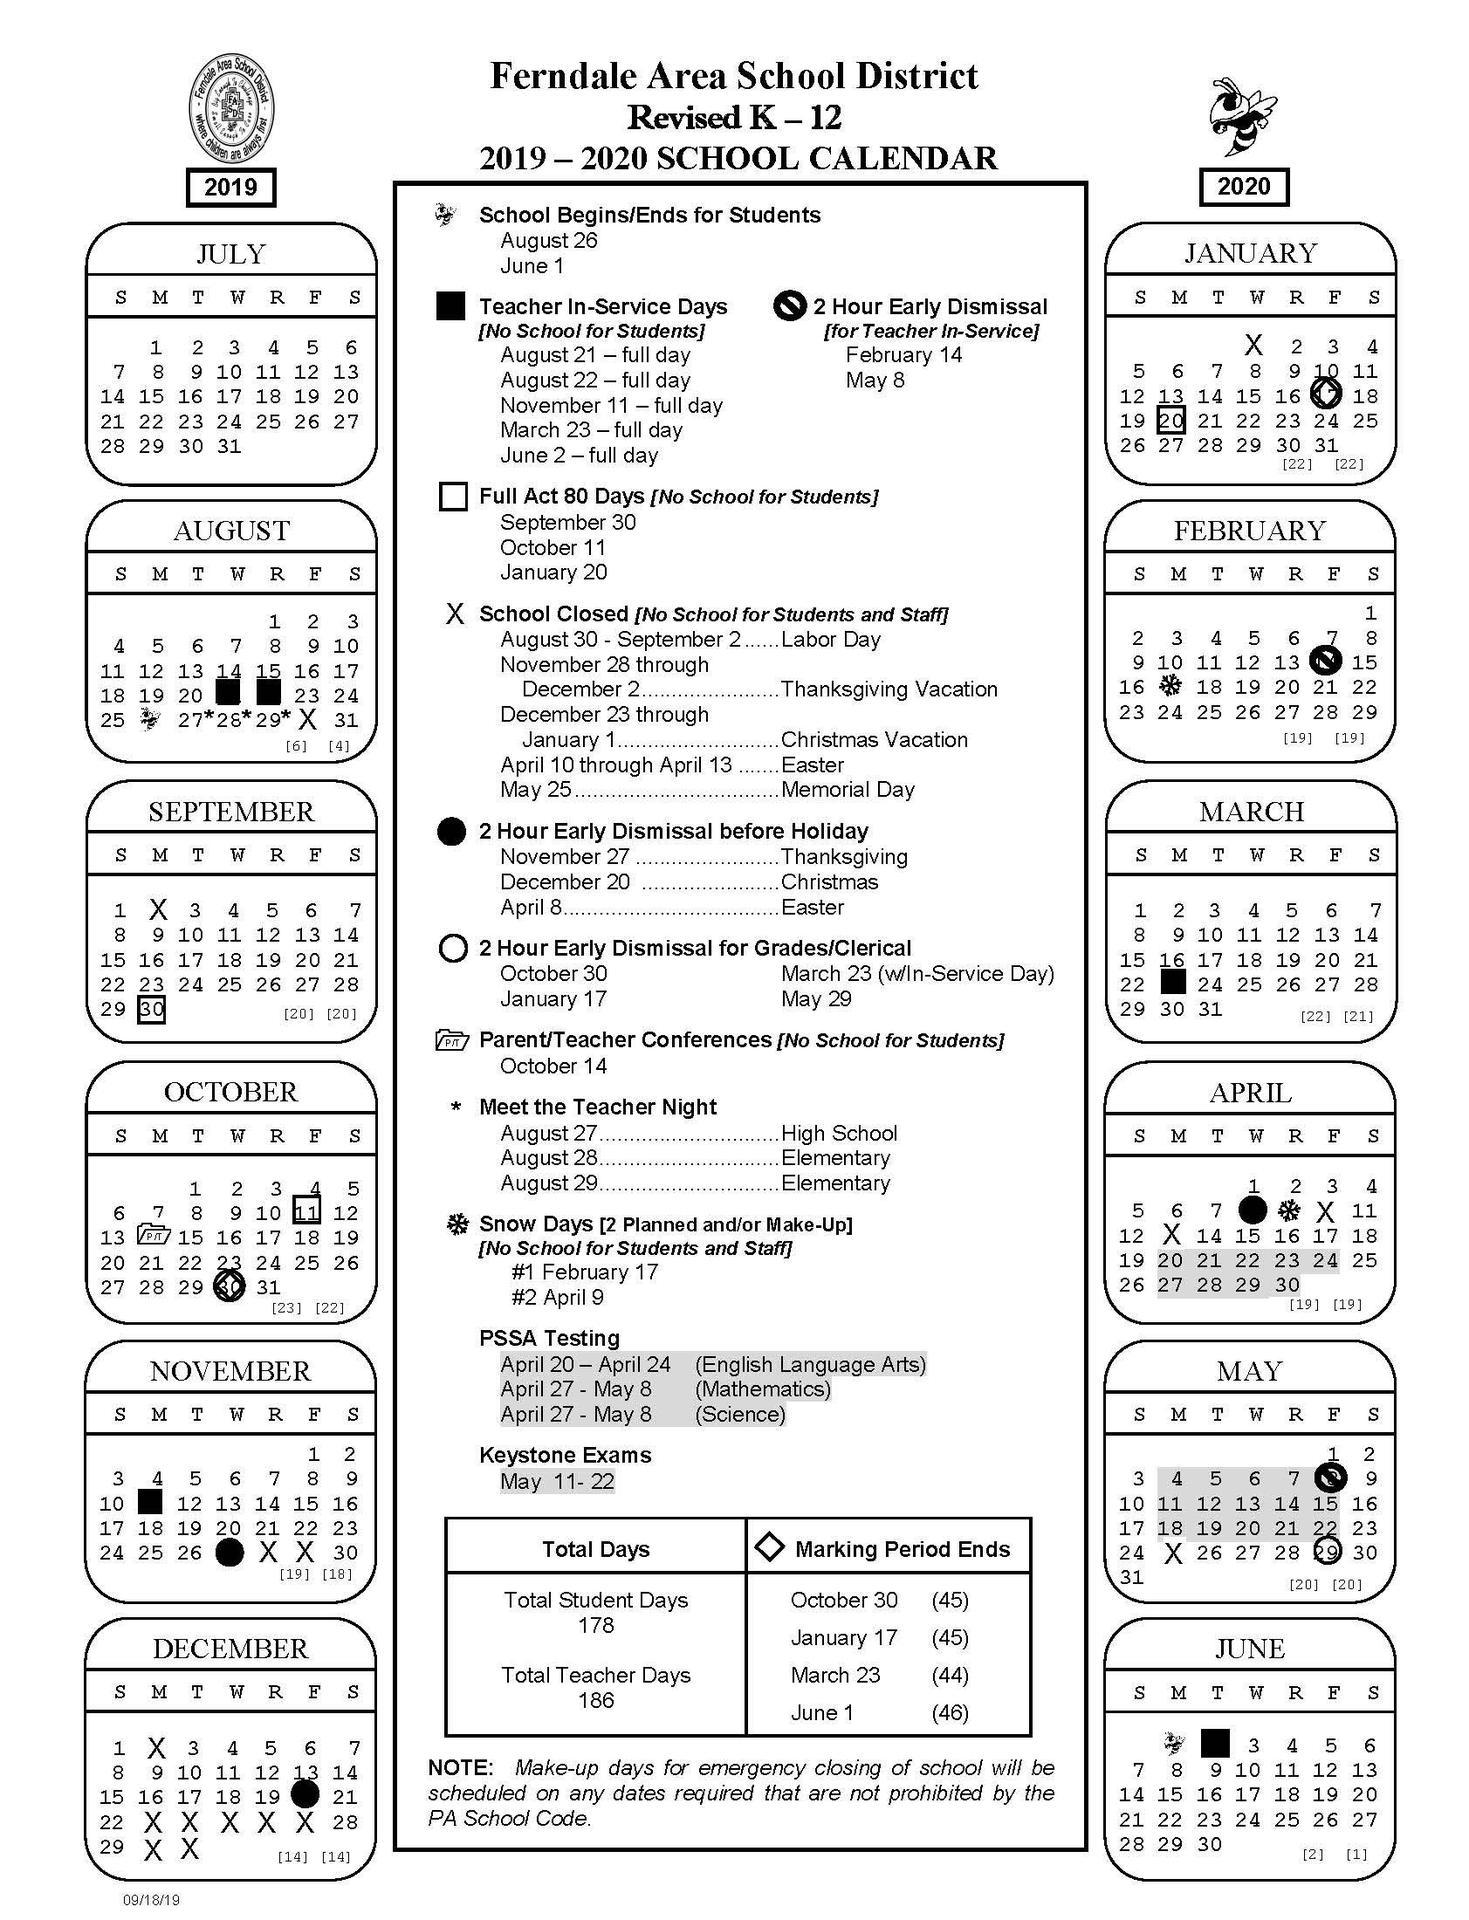 2019 - 2020 Revised K-12 School Calendar